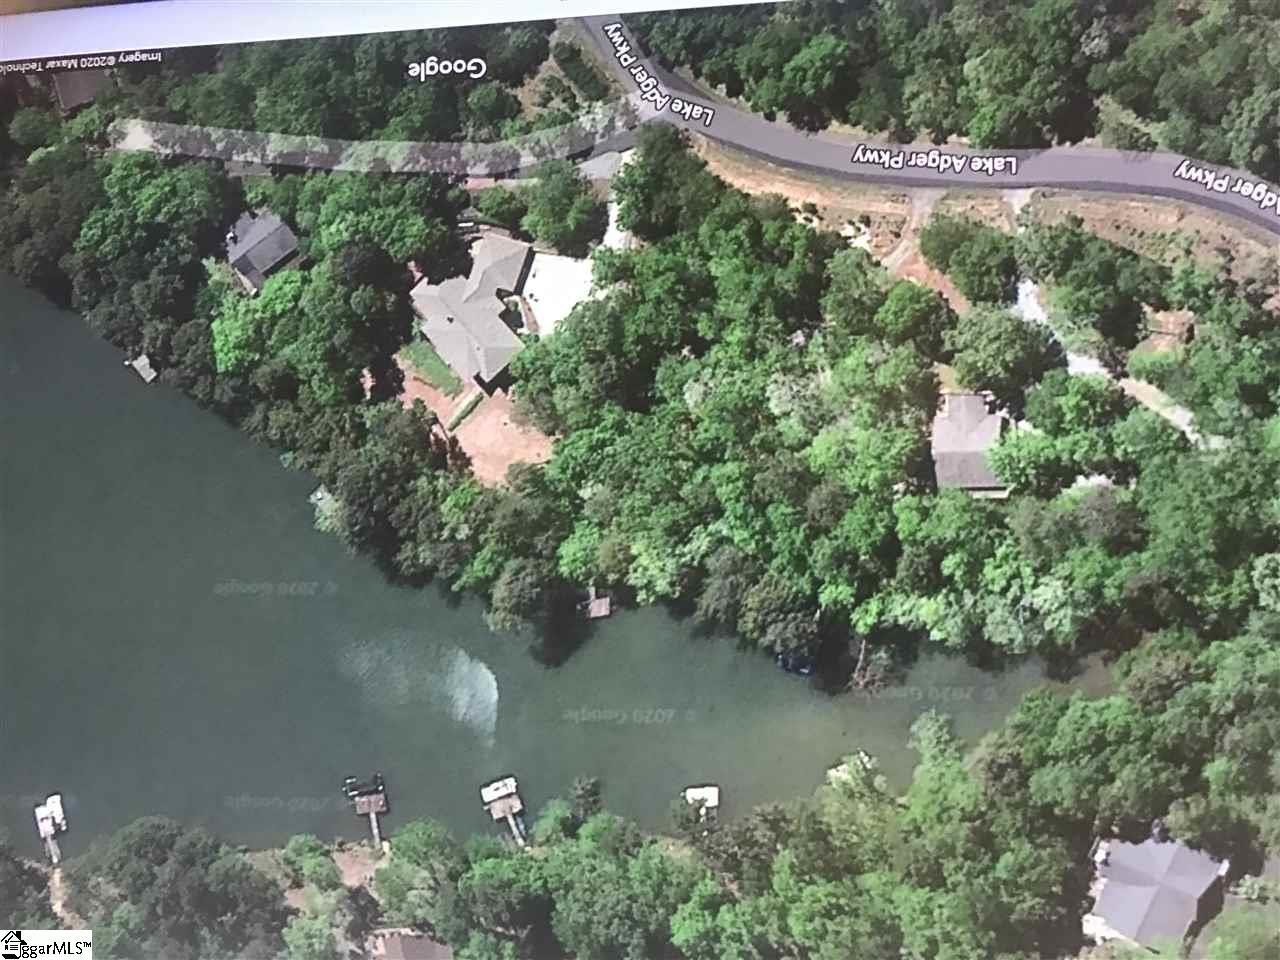 Lake Adger Parkway Mill Spring, NC 28756